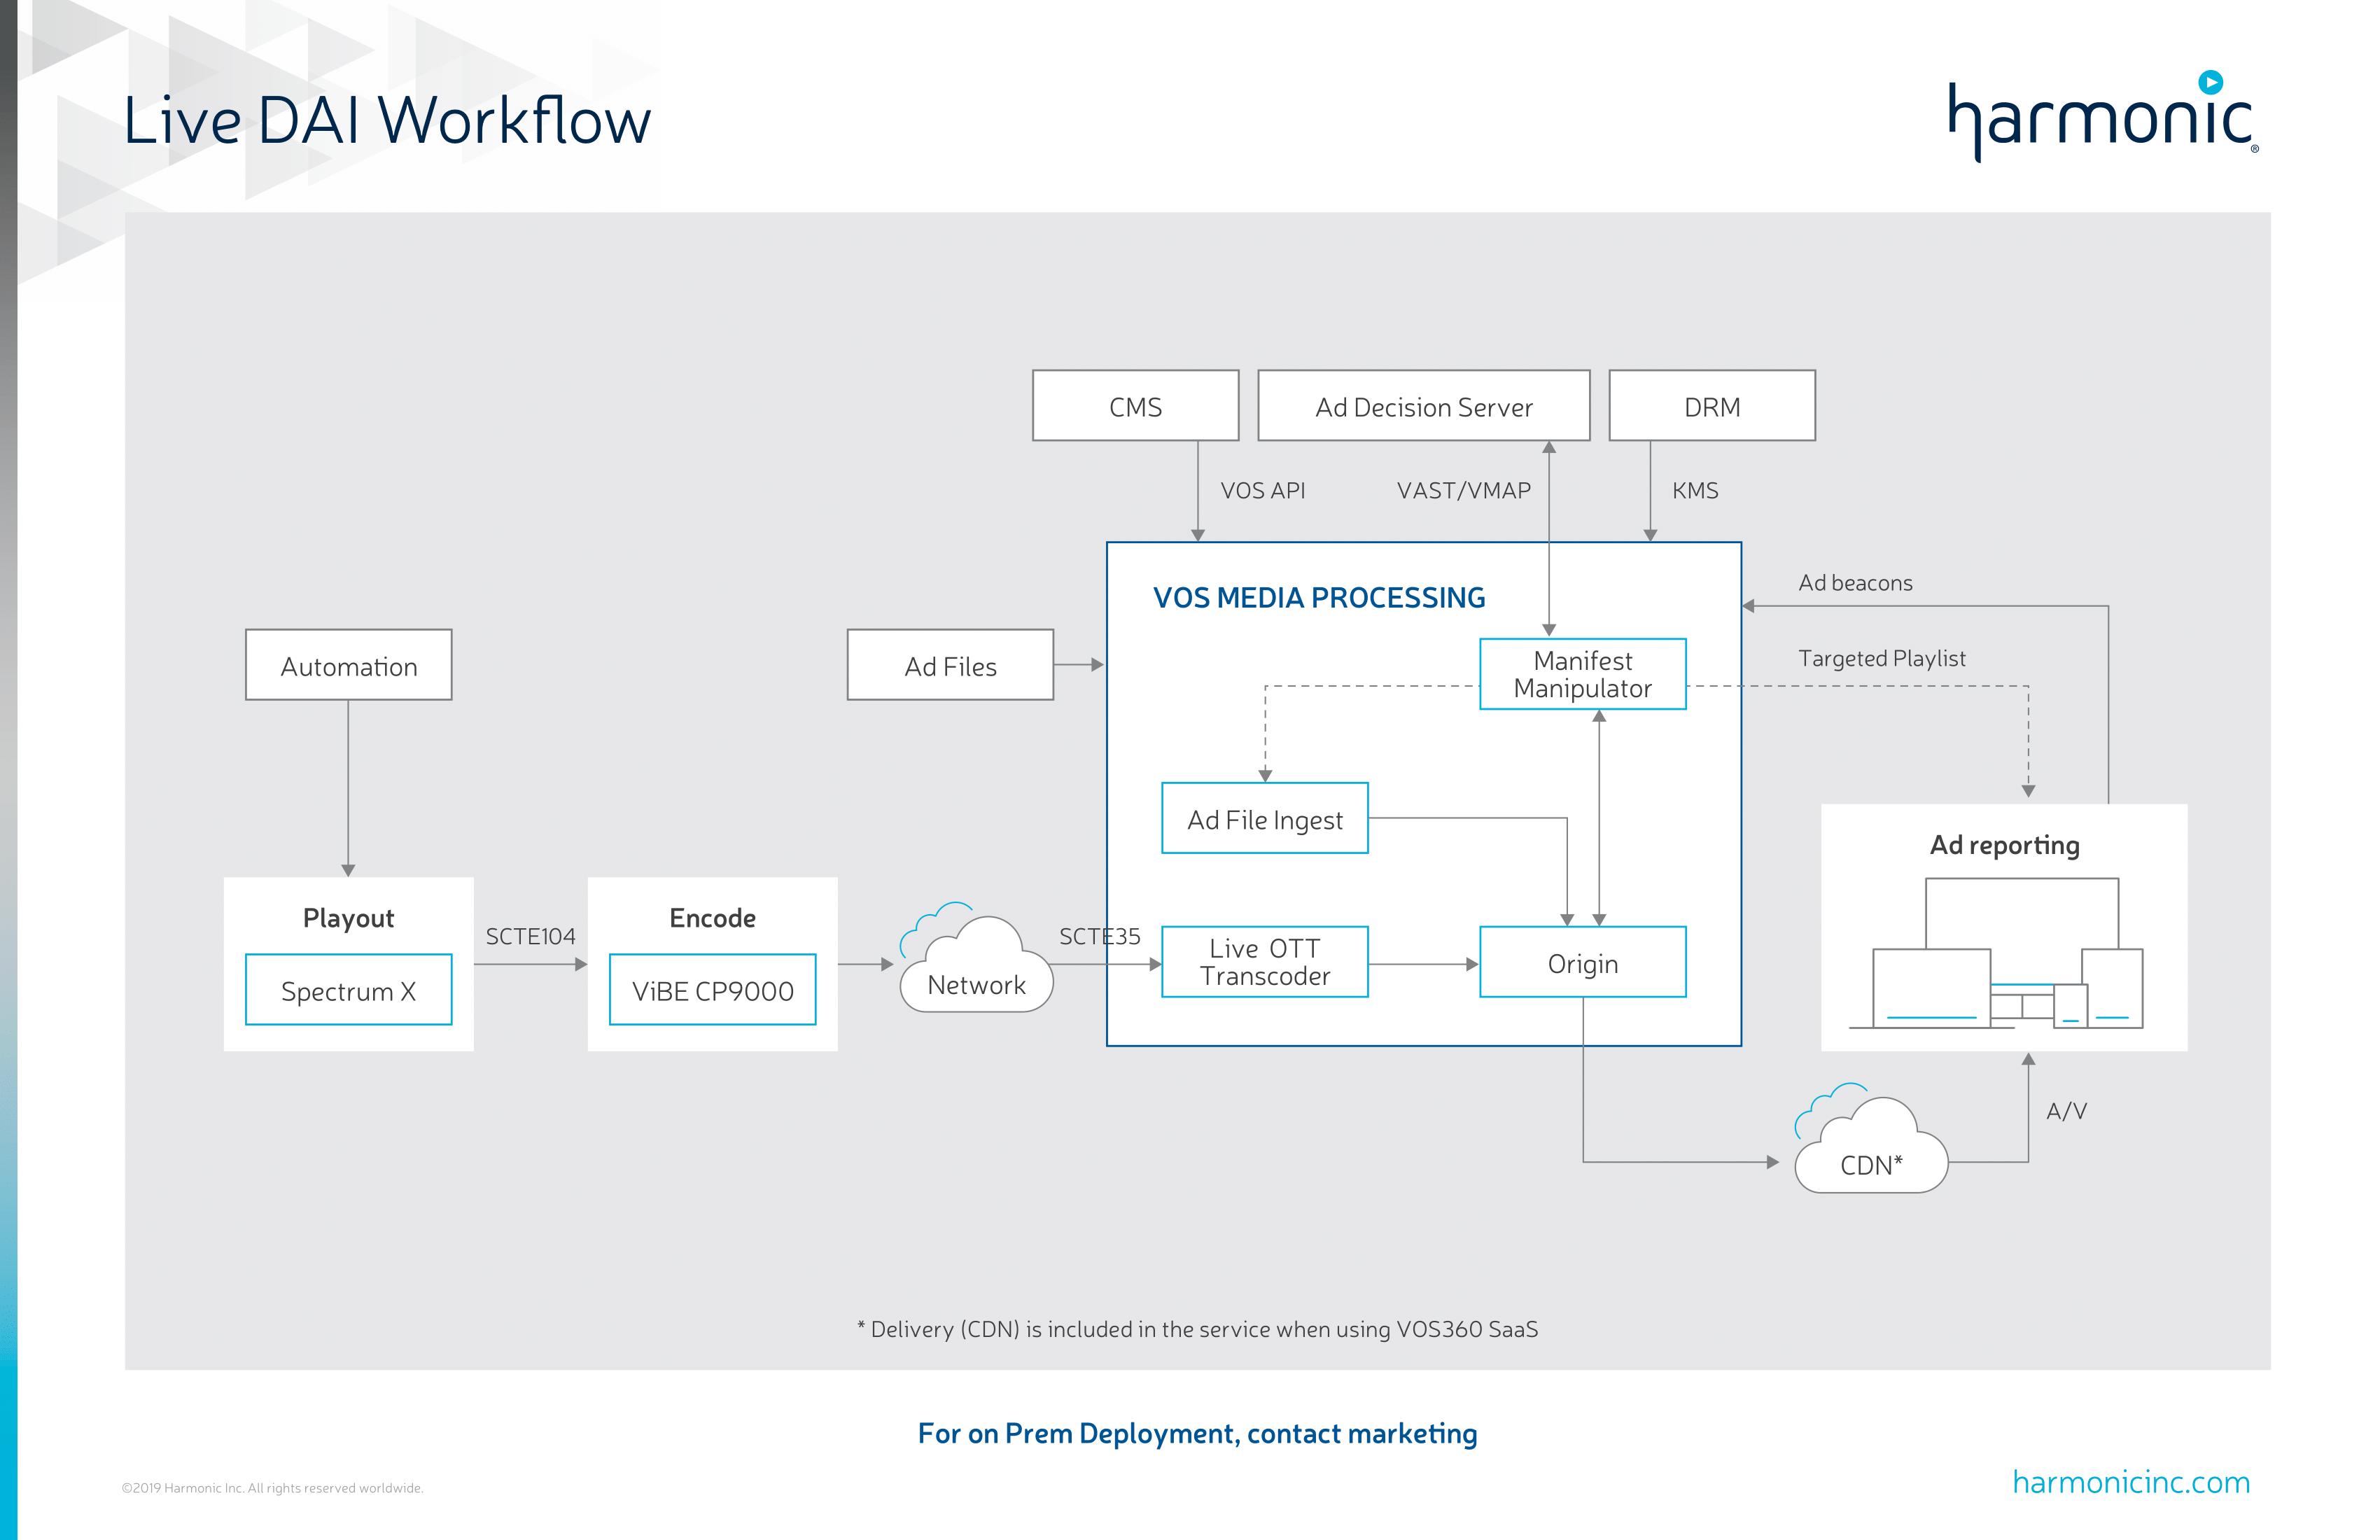 Live DAI Workflow